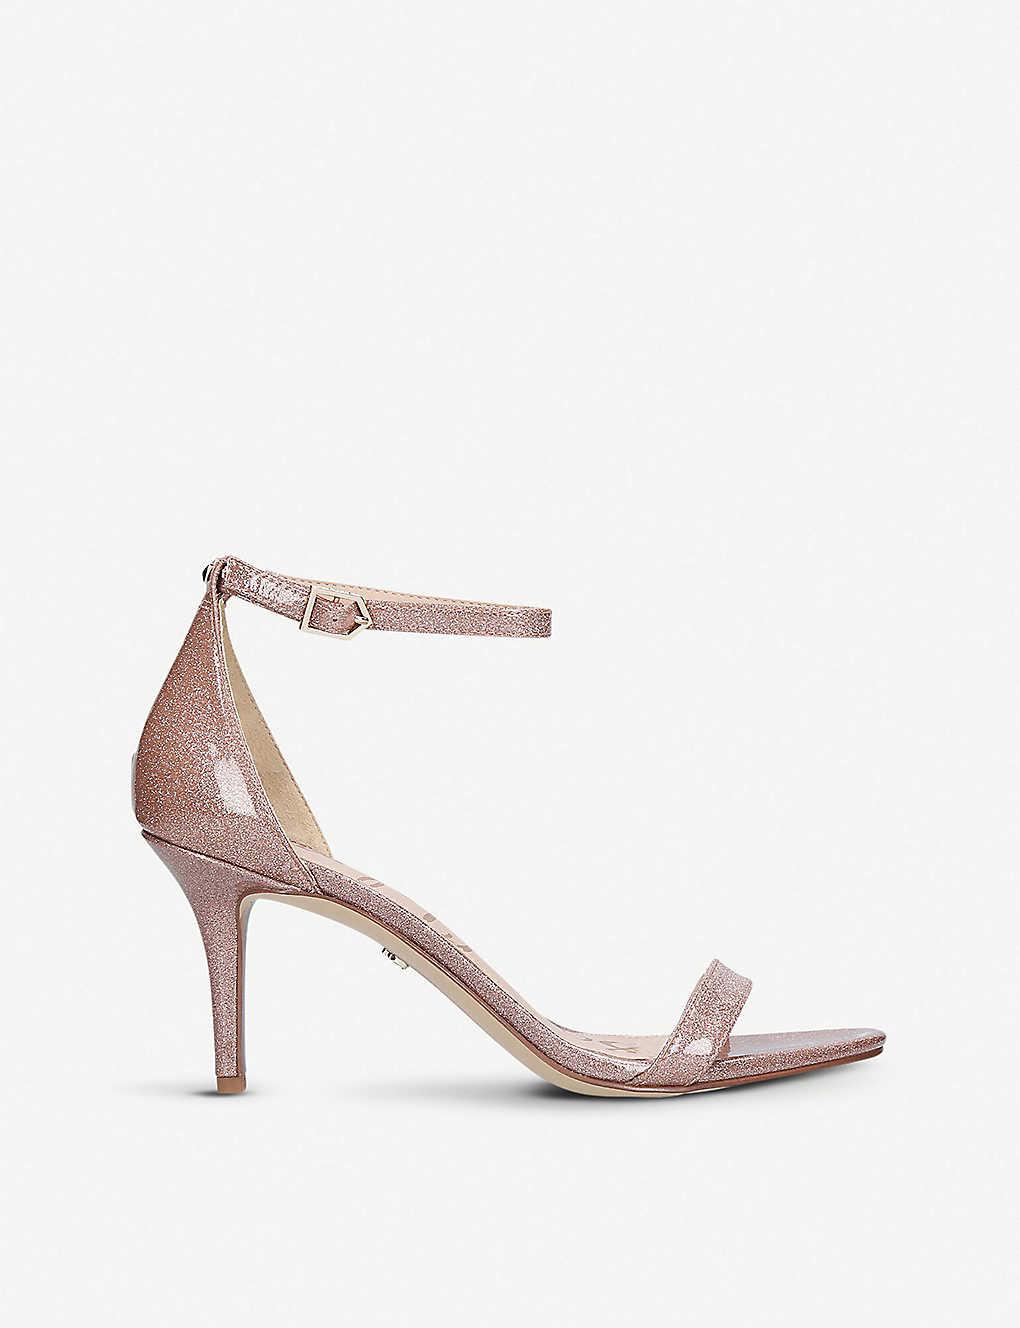 36d79804ec7fc0 SAM EDELMAN - Patti glittered patent-leather two-part sandals ...